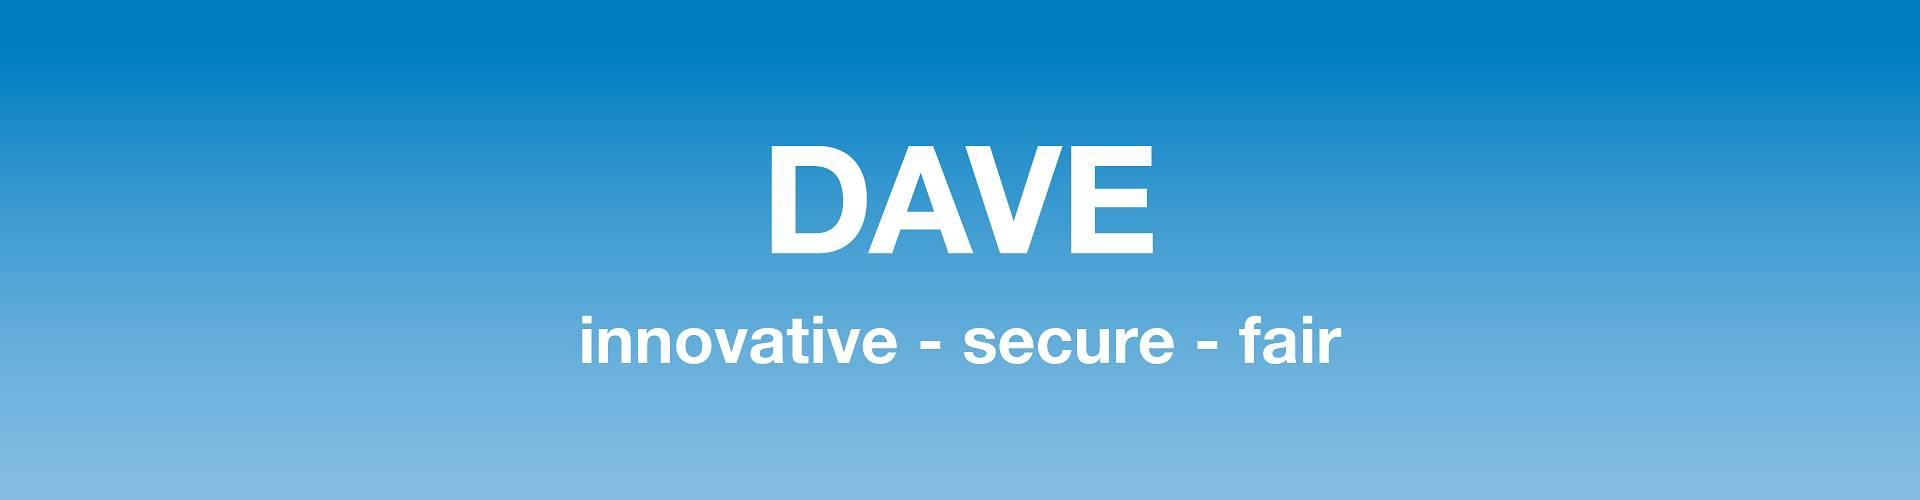 DAVE - innovative - secure - fair RE/MAX